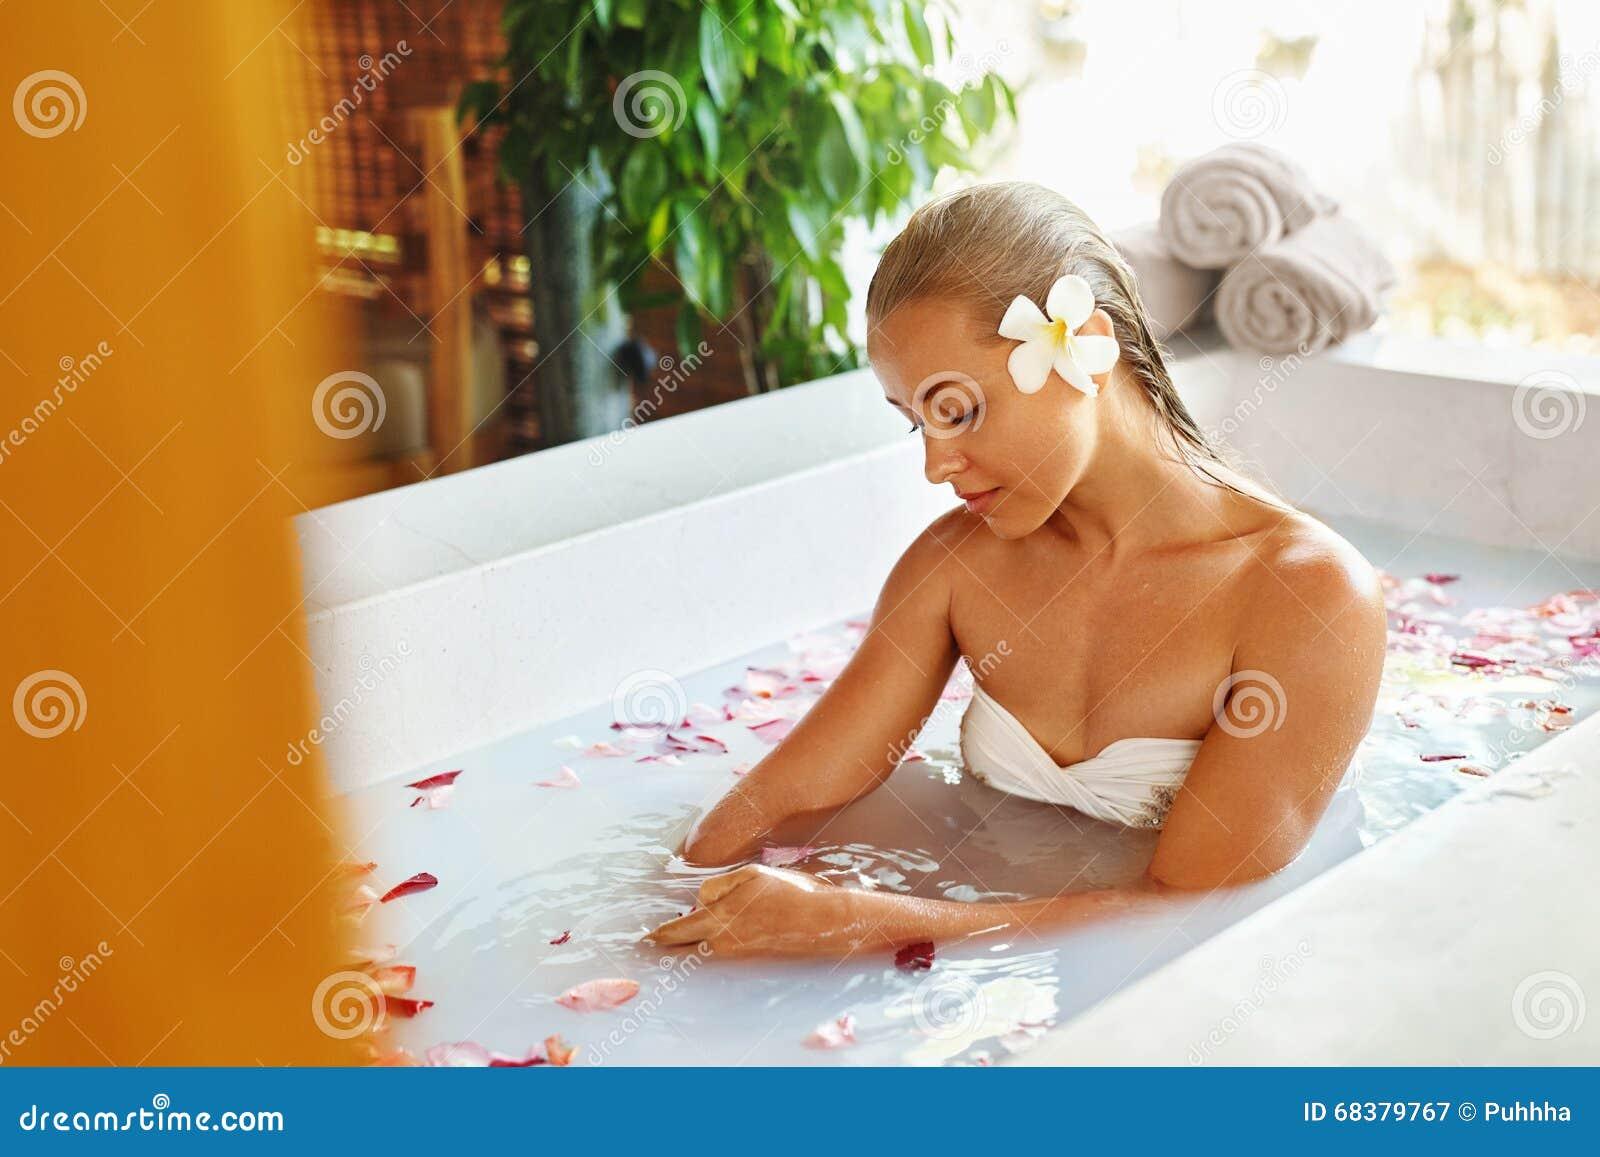 Bath having in sex tub woman woman